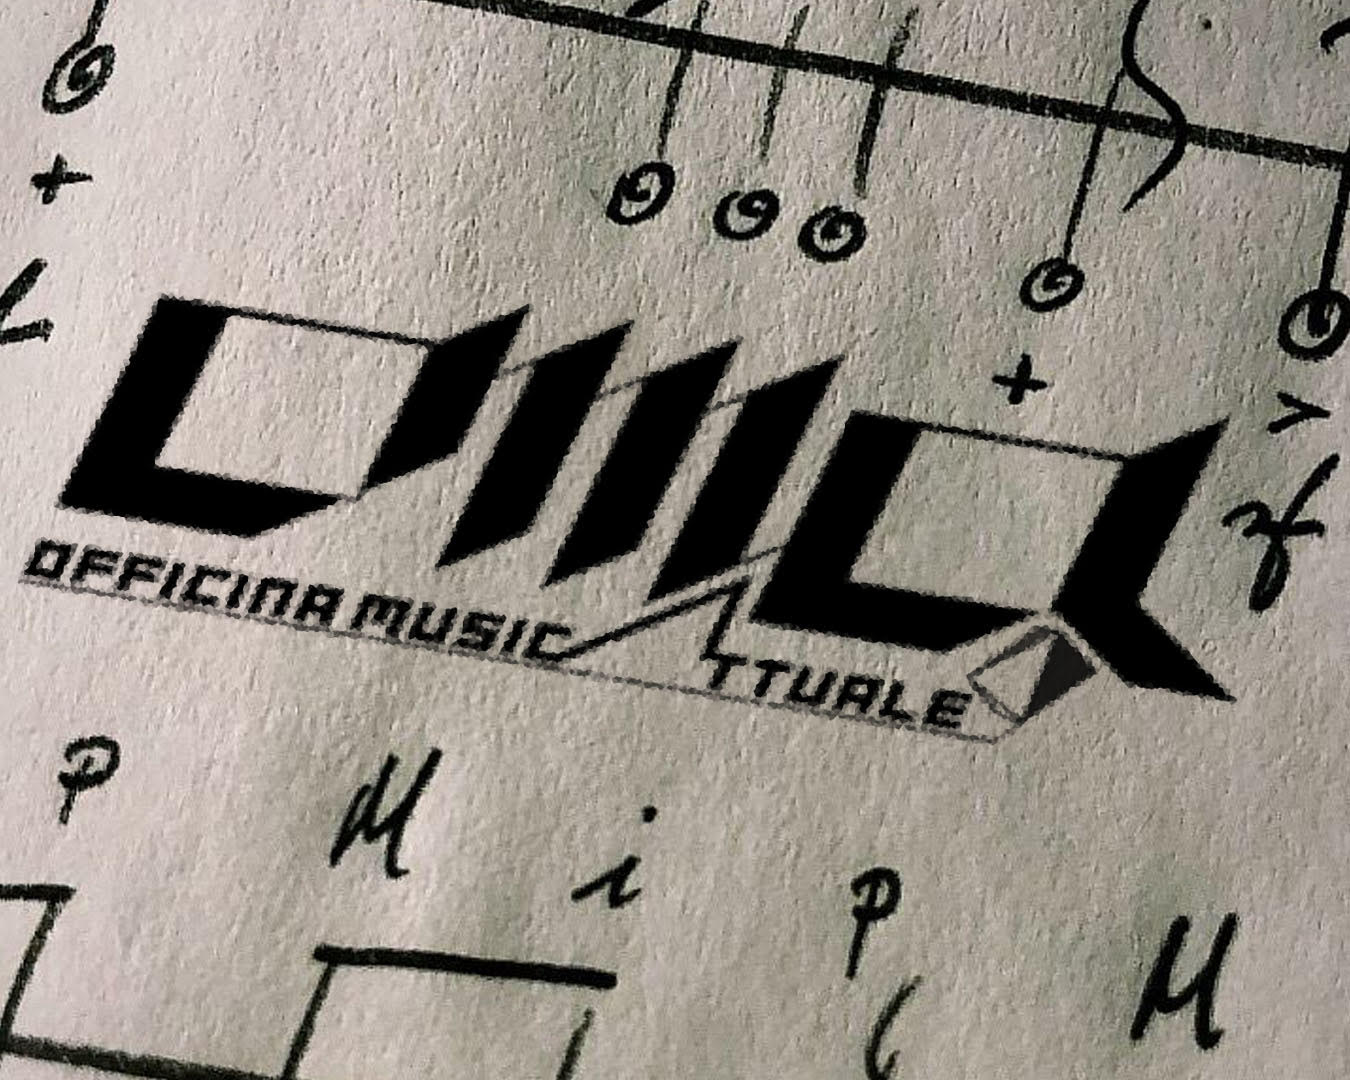 Officina Musicattuale